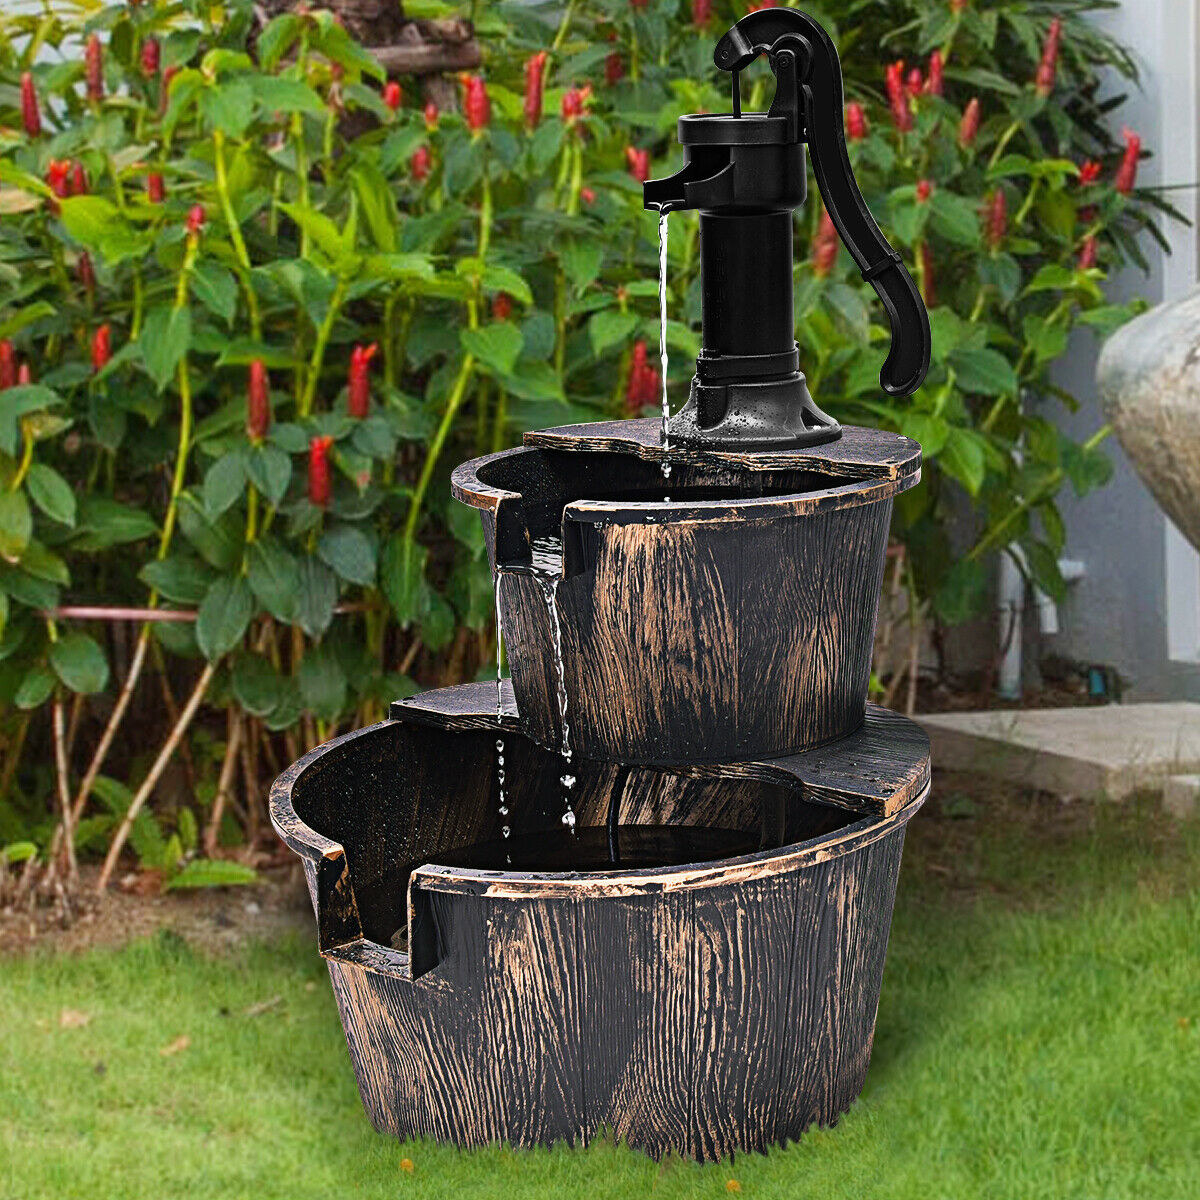 The Gymax 2 Tier Barrel Waterfall Fountain in a garden